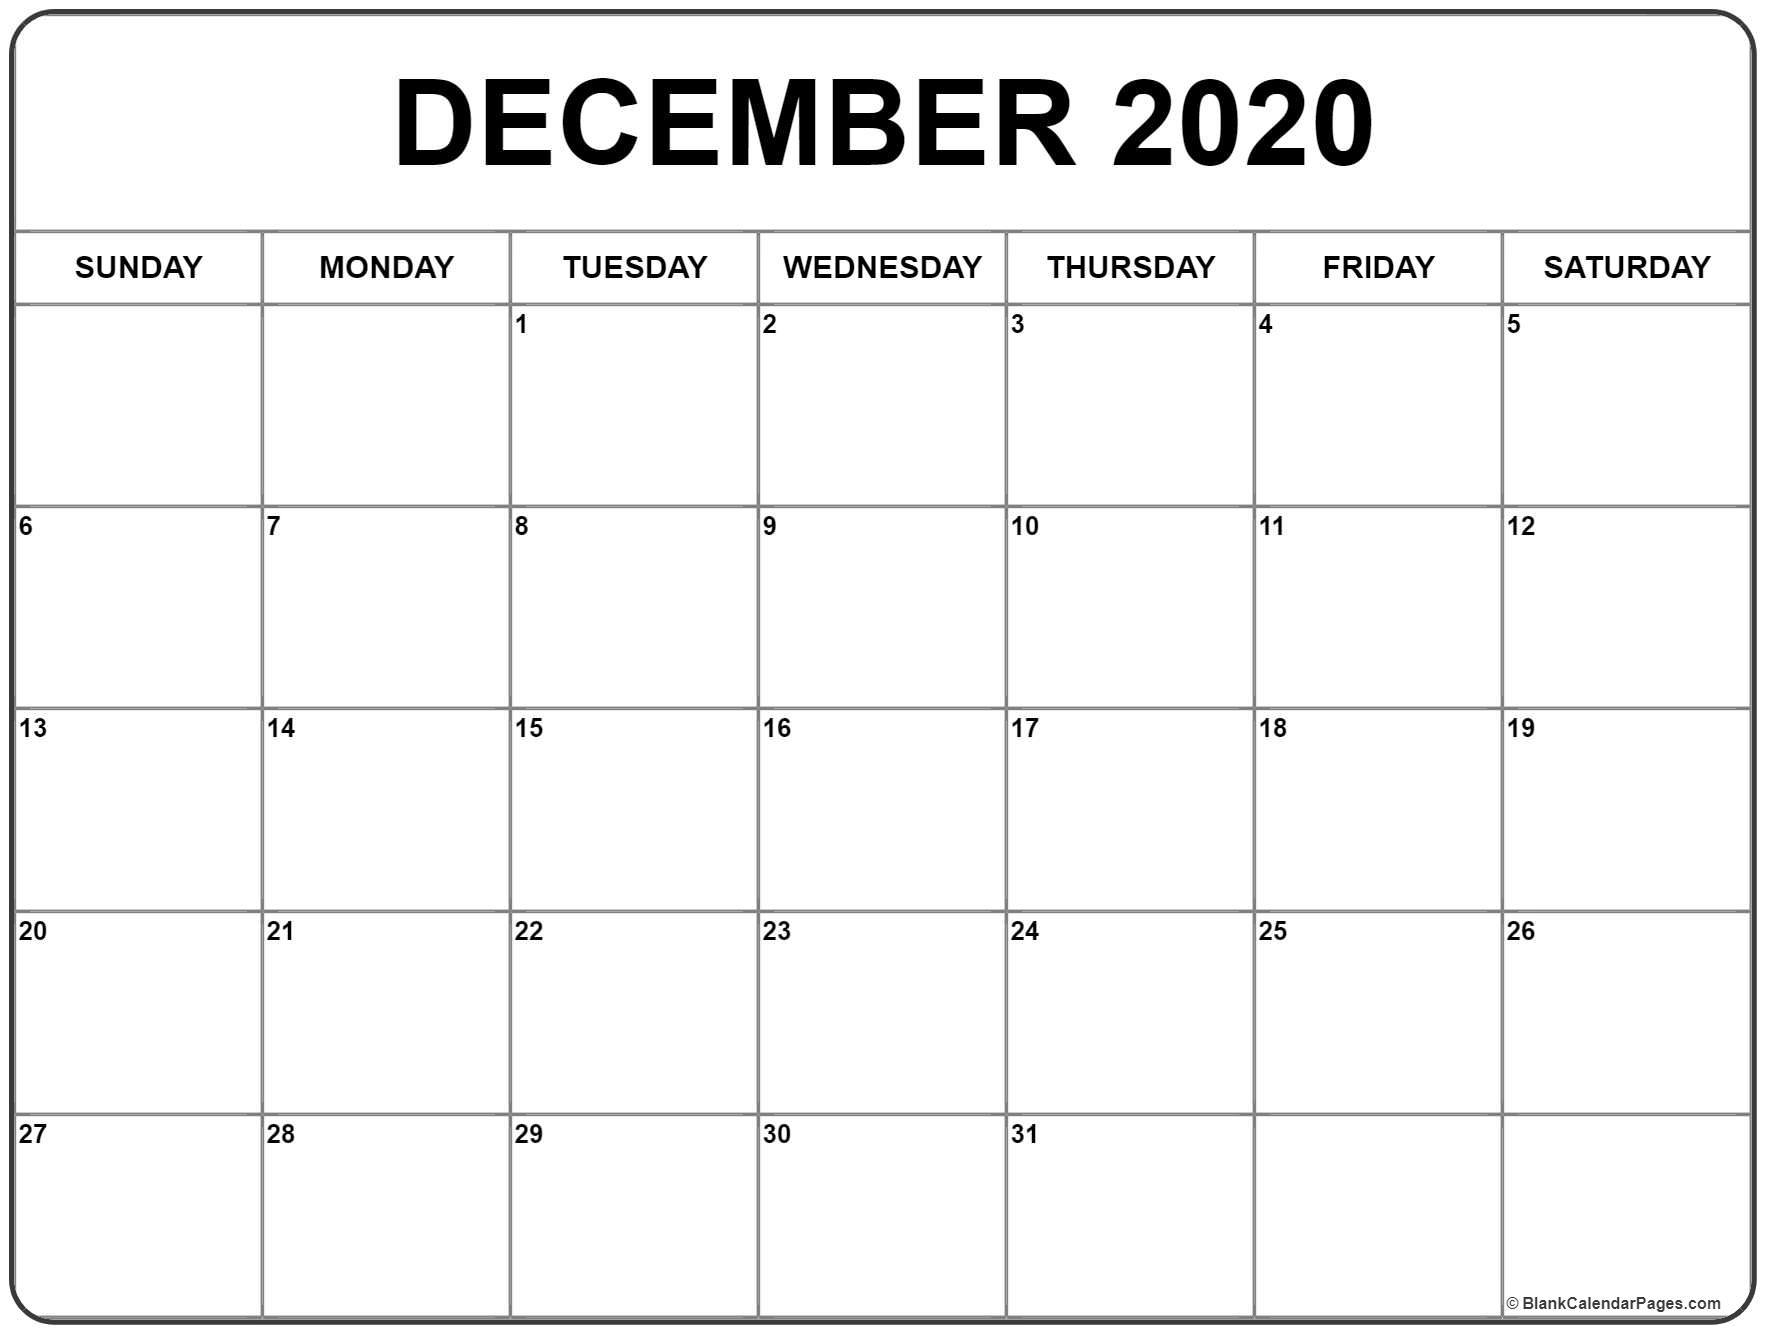 January Thru December 2020 Printable Monthly Calendar